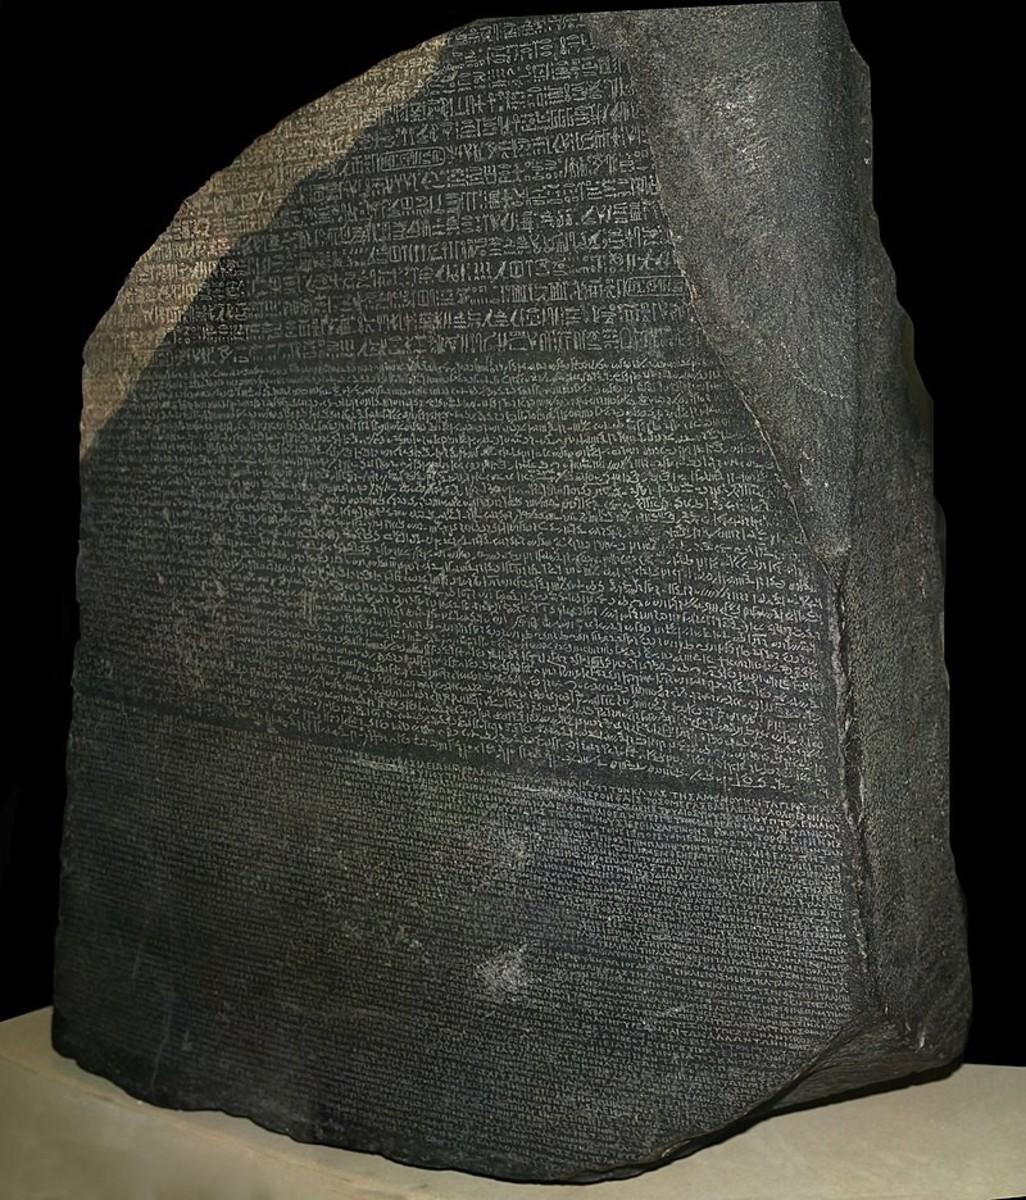 The Rosetta Stone in the British Museum.